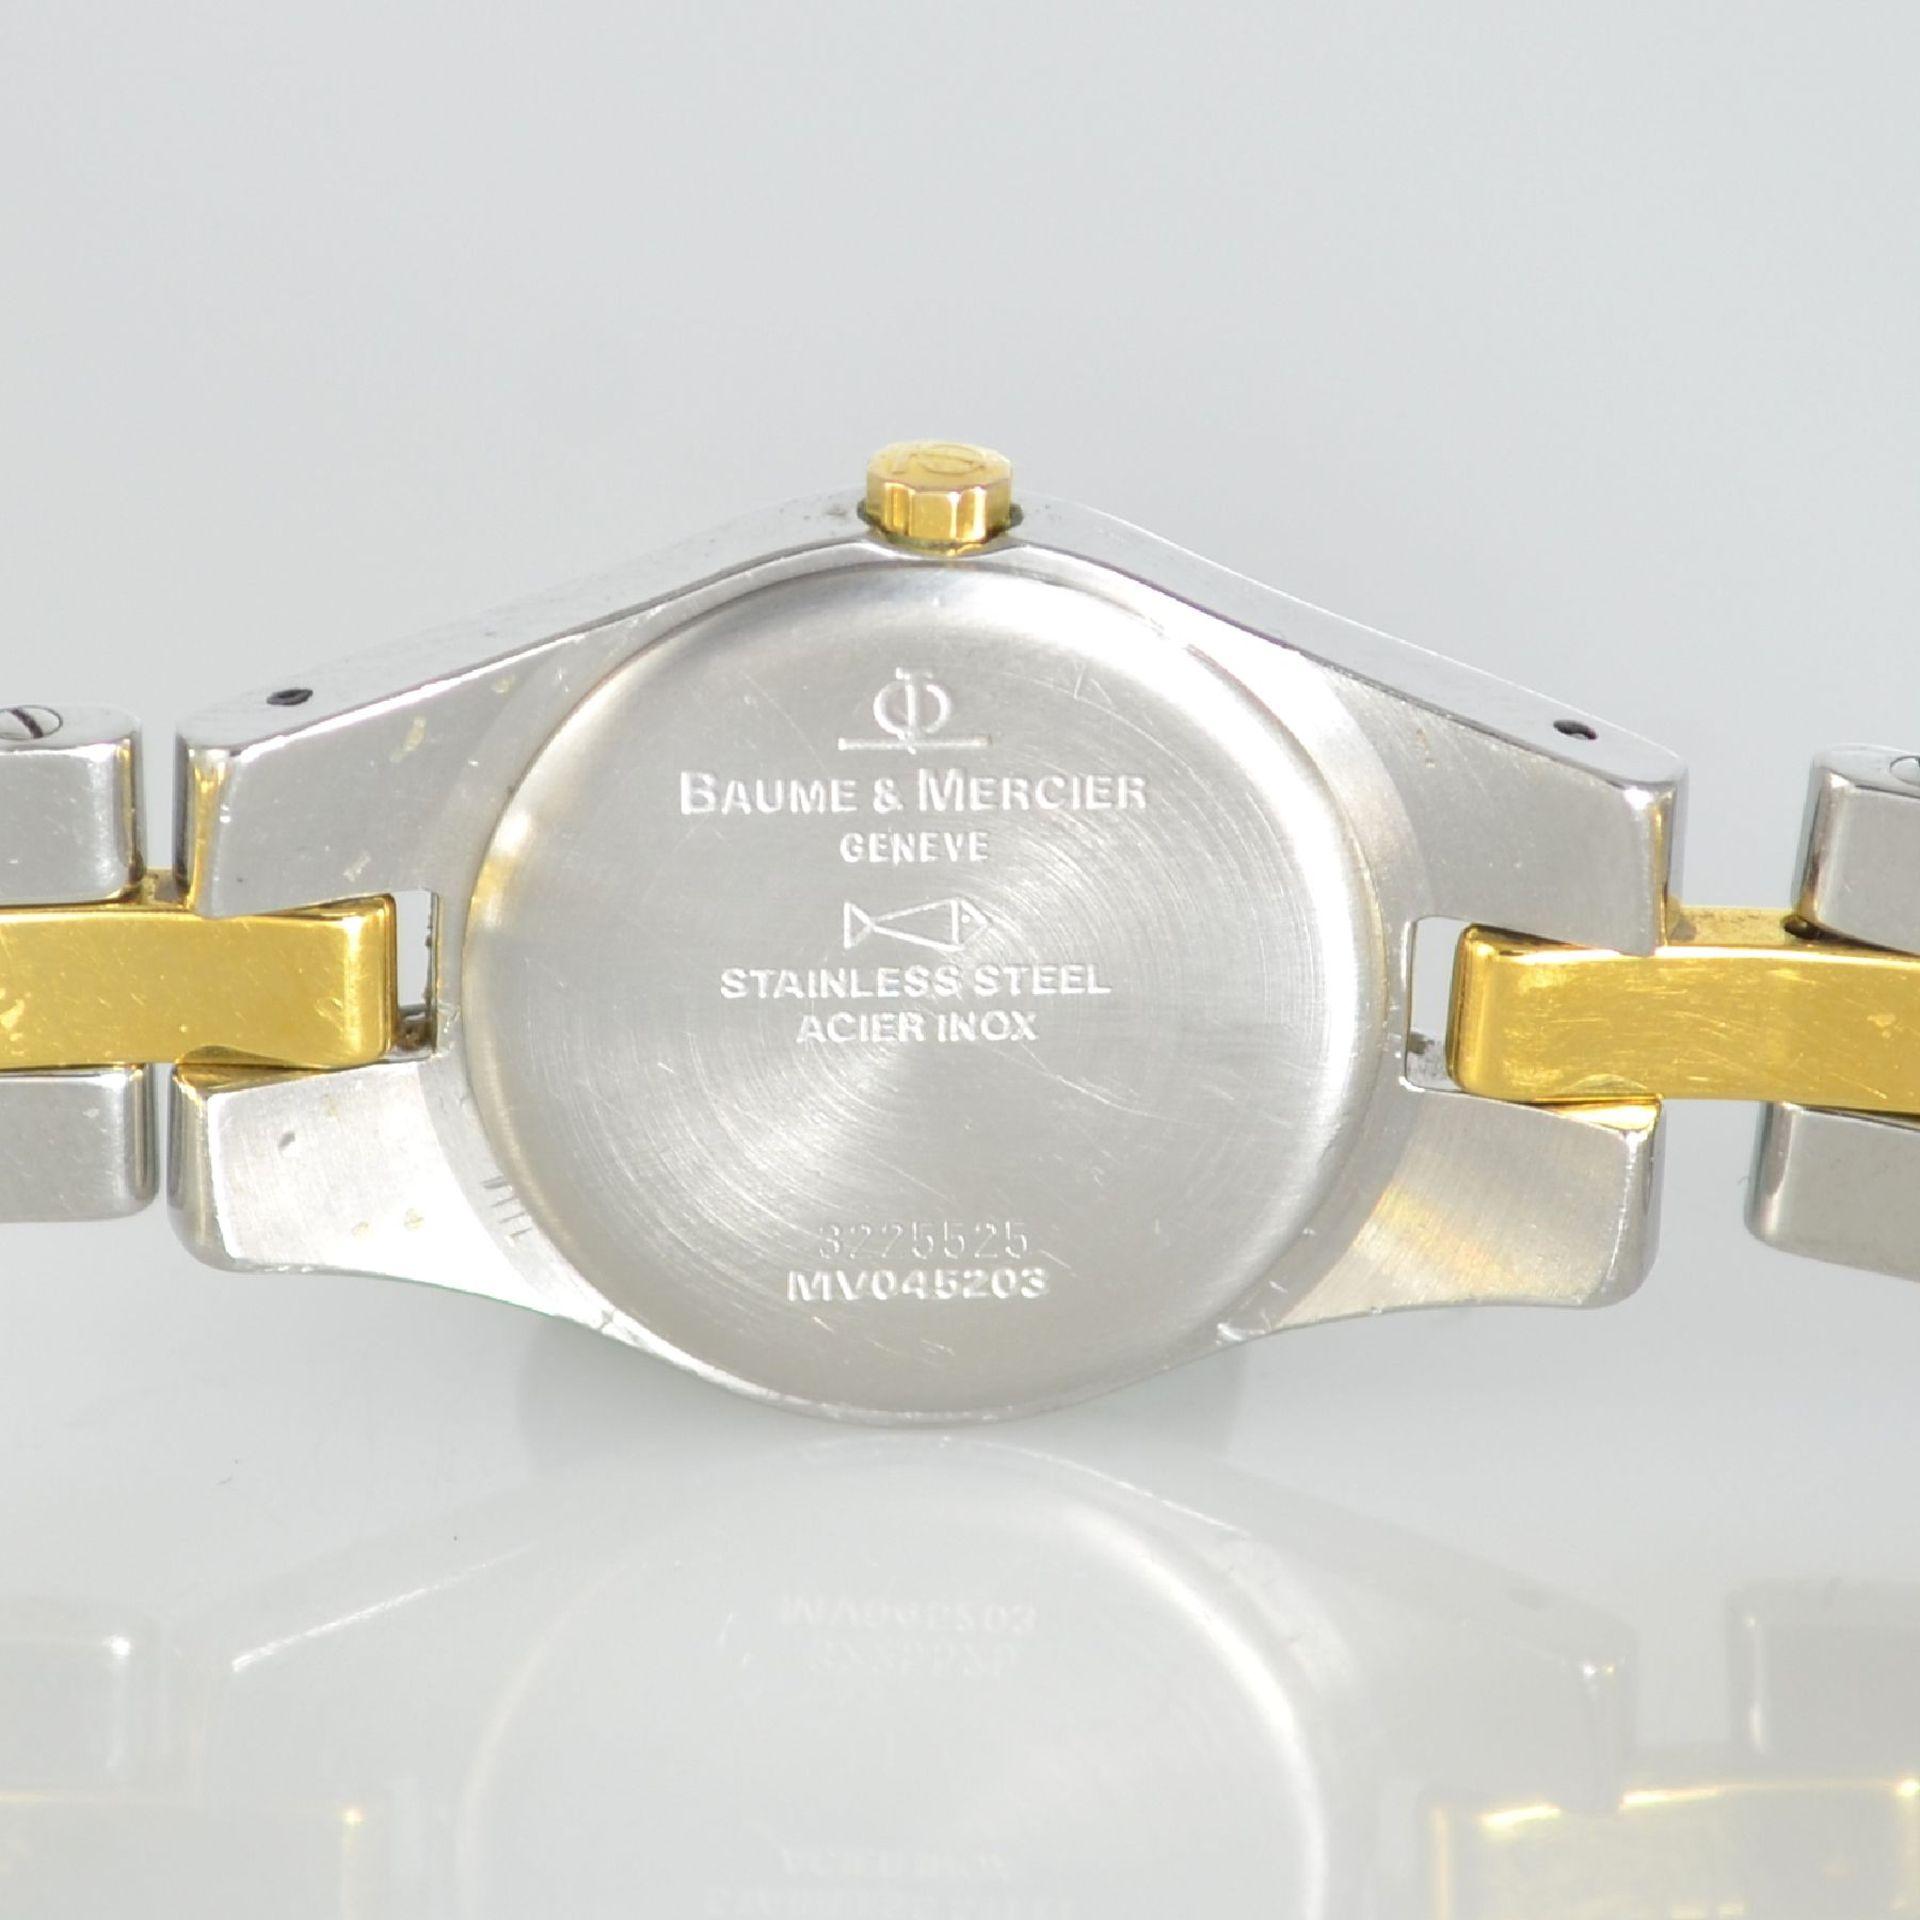 BAUME & MERCIER Damenarmbanduhr in Stahl/ vergoldet, Schweiz um 2000, gedr. Geh. m. integr. - Bild 6 aus 6